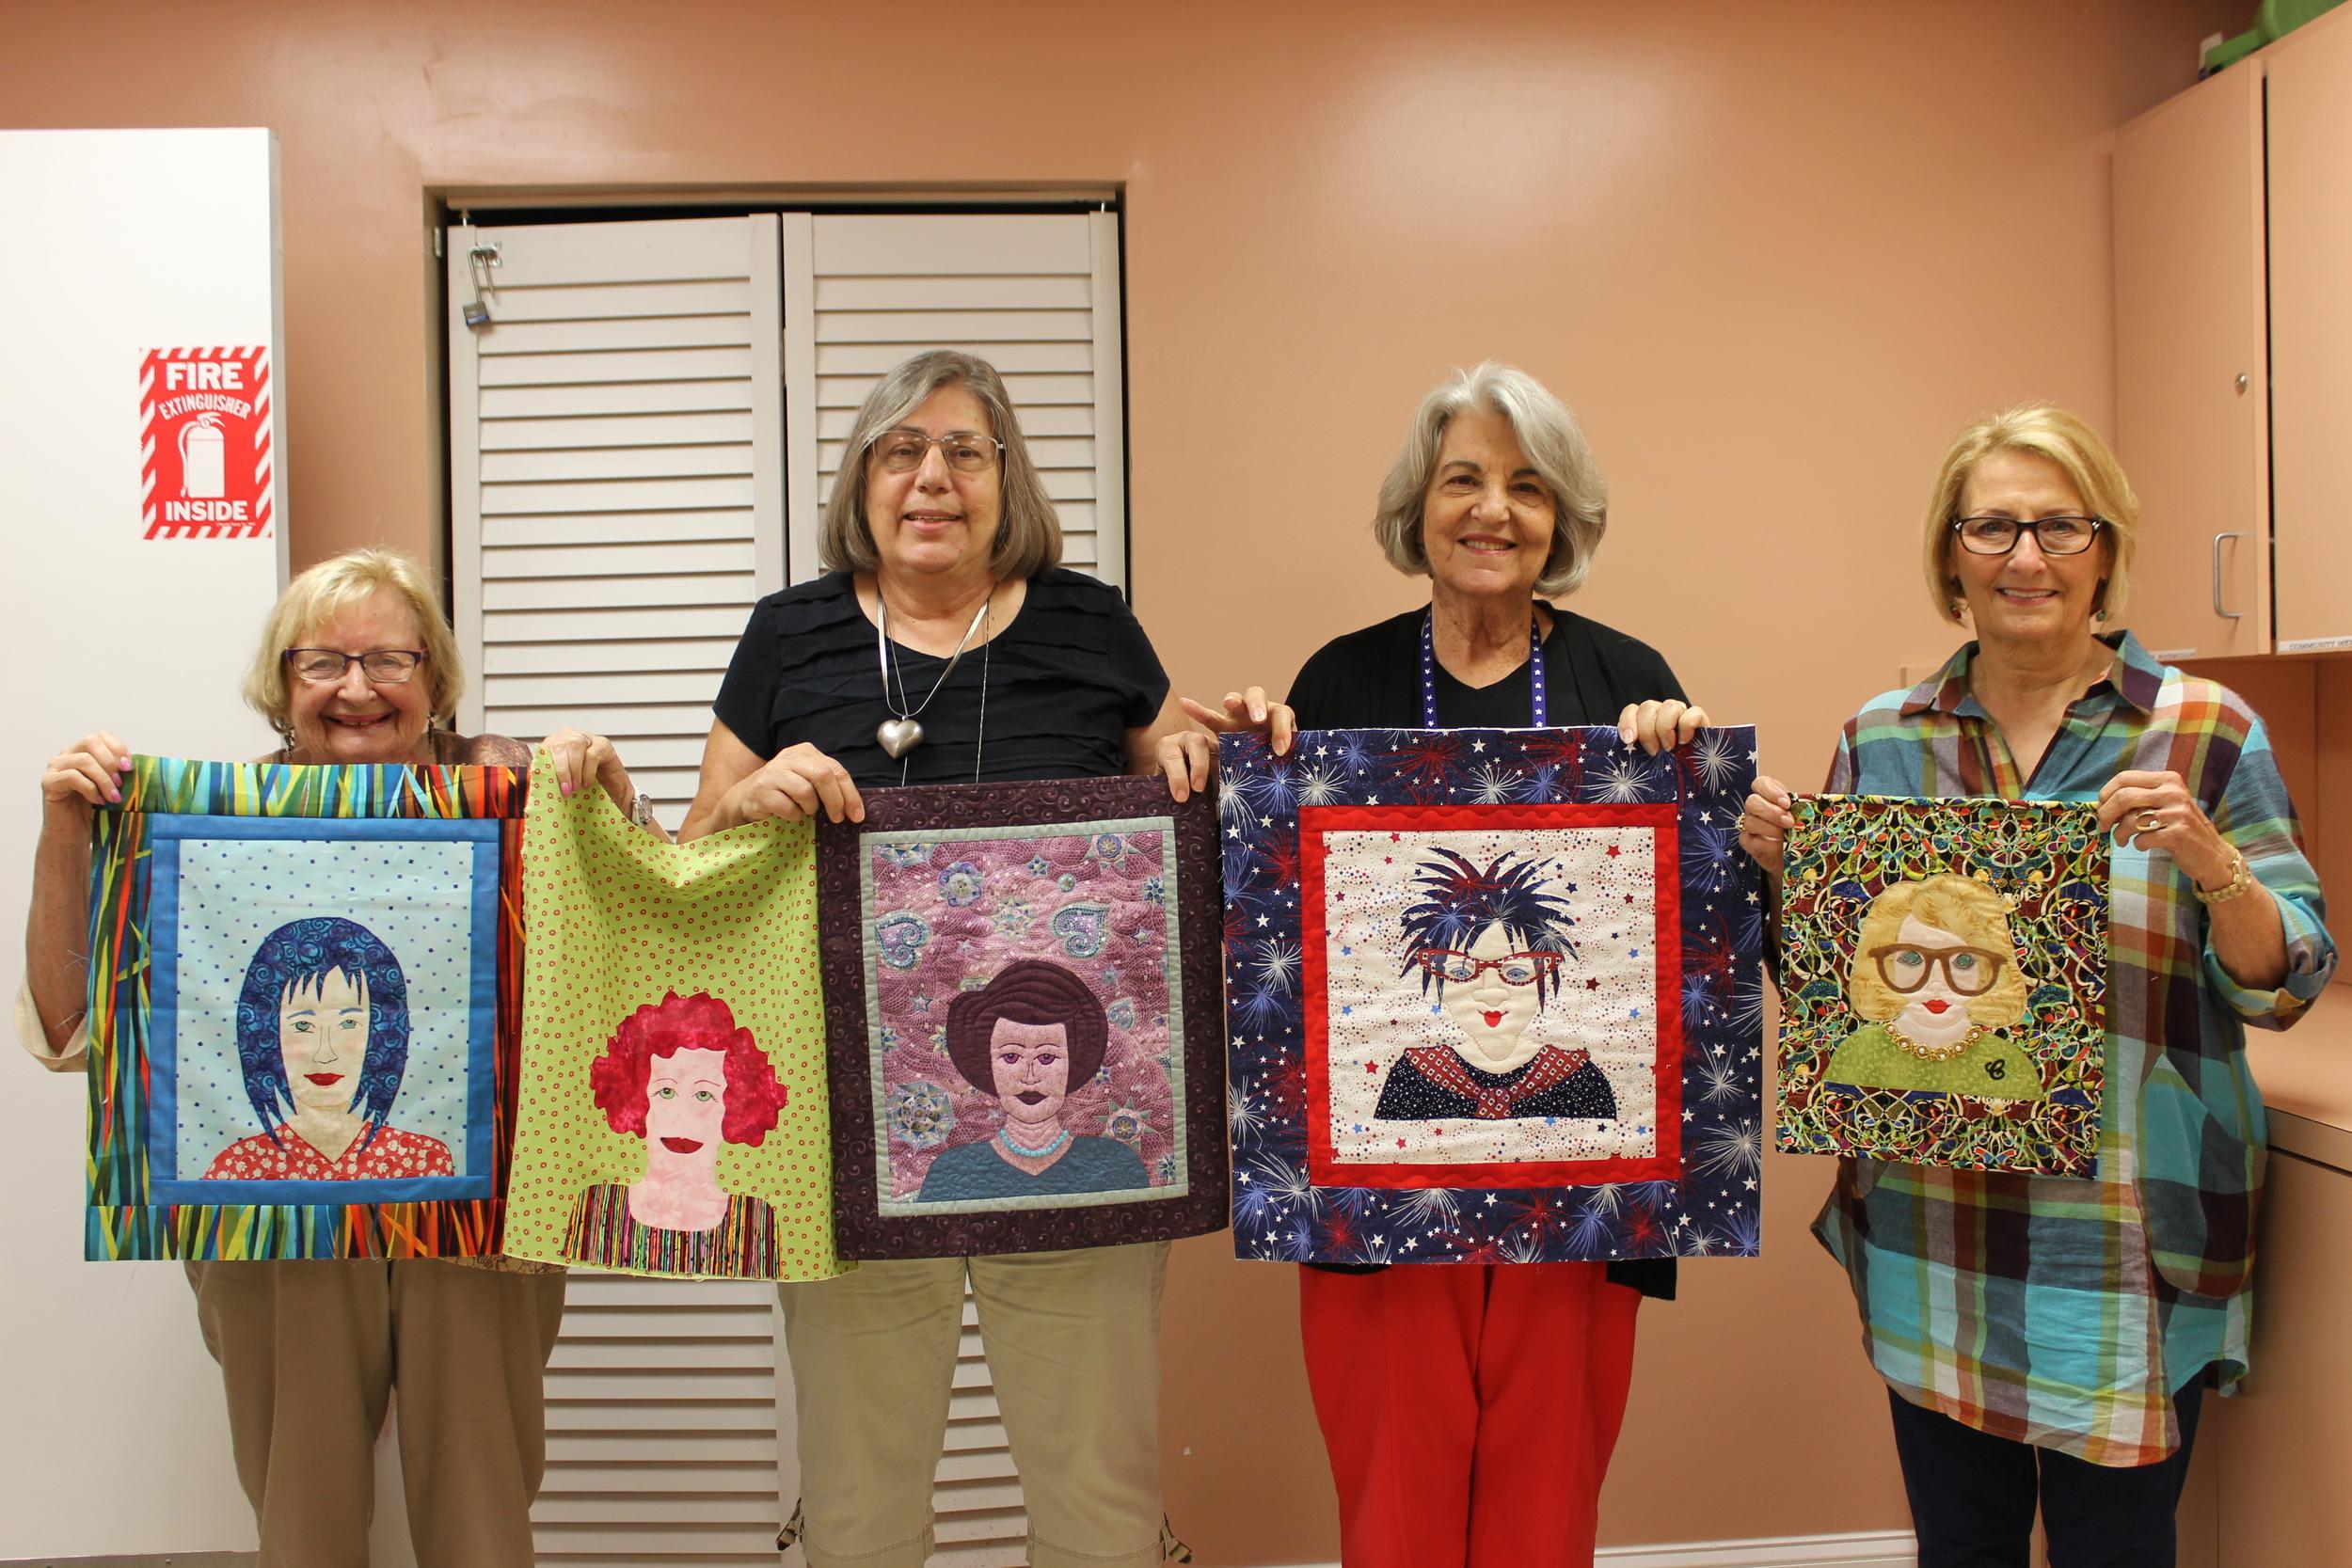 EZ Portrait quilters L-R Doris Sagor, Dorothy McDonnell, Elen Birnbaum, Carol Stoltenberg.JPG